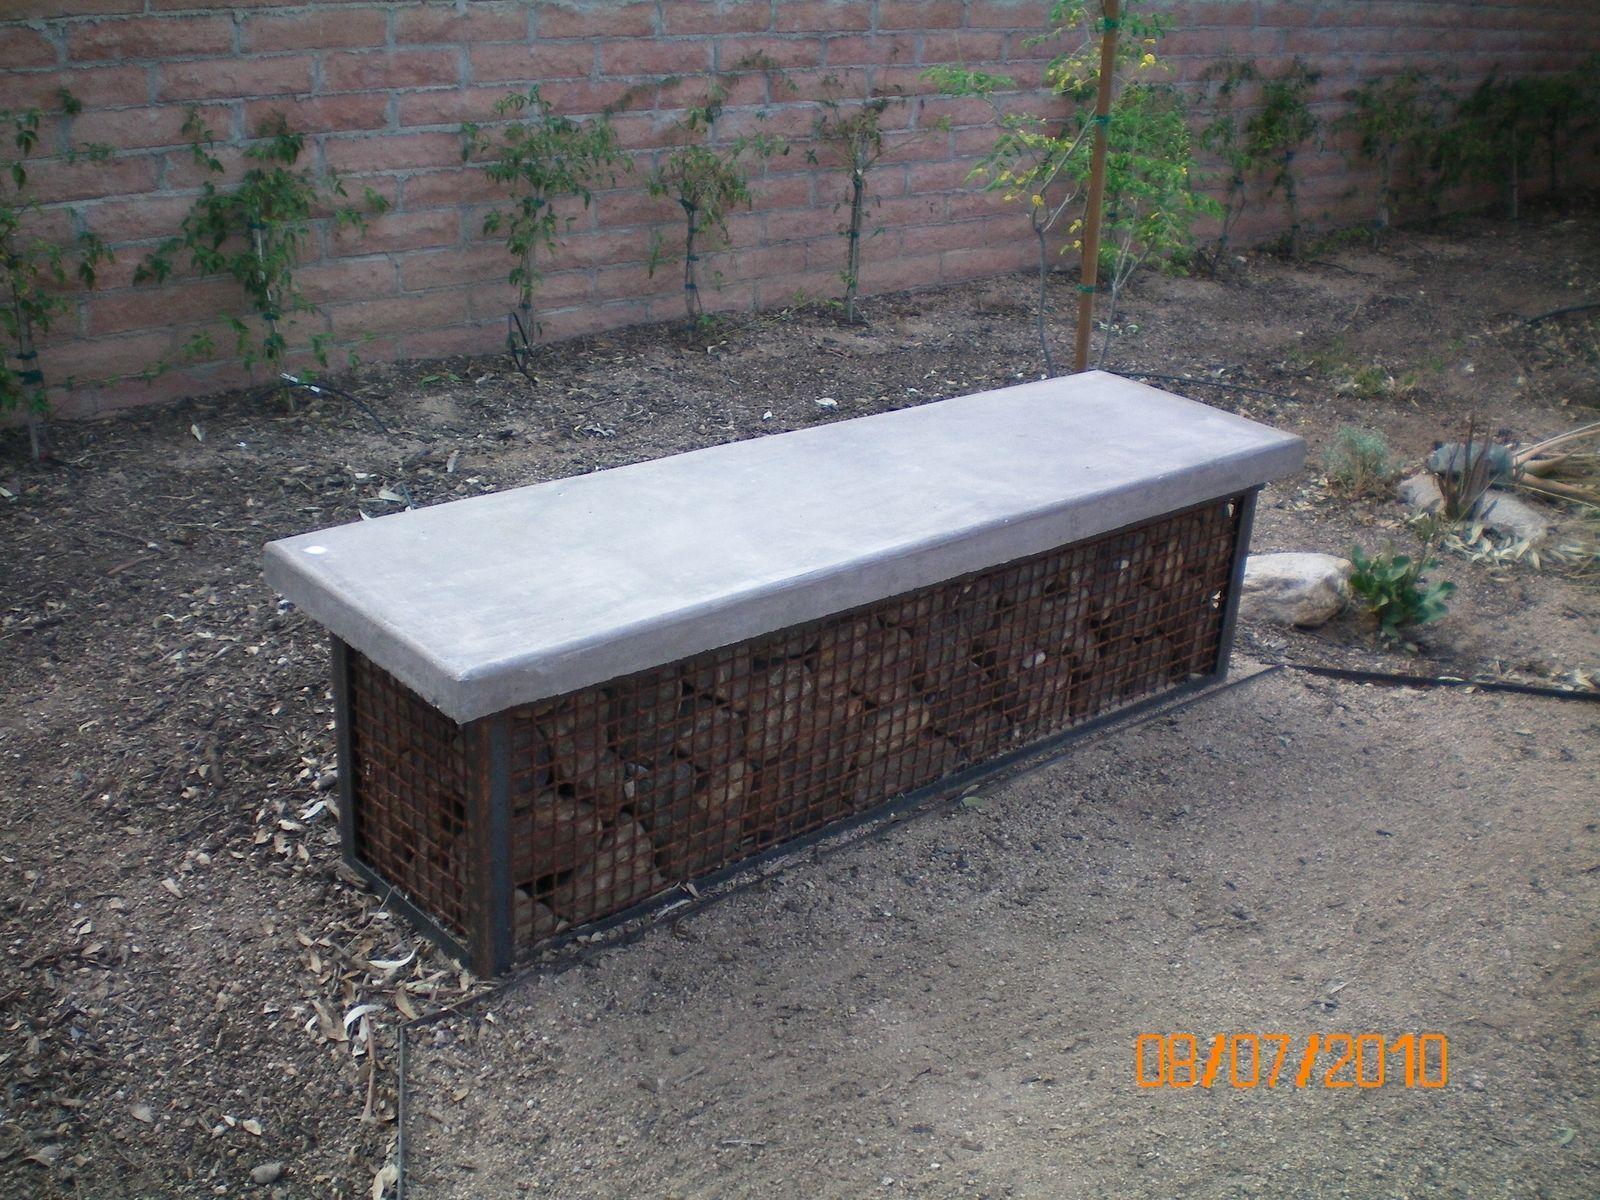 Enjoyable Handmade Gabian Garden Bench By Simpatico Builders Inc Inzonedesignstudio Interior Chair Design Inzonedesignstudiocom